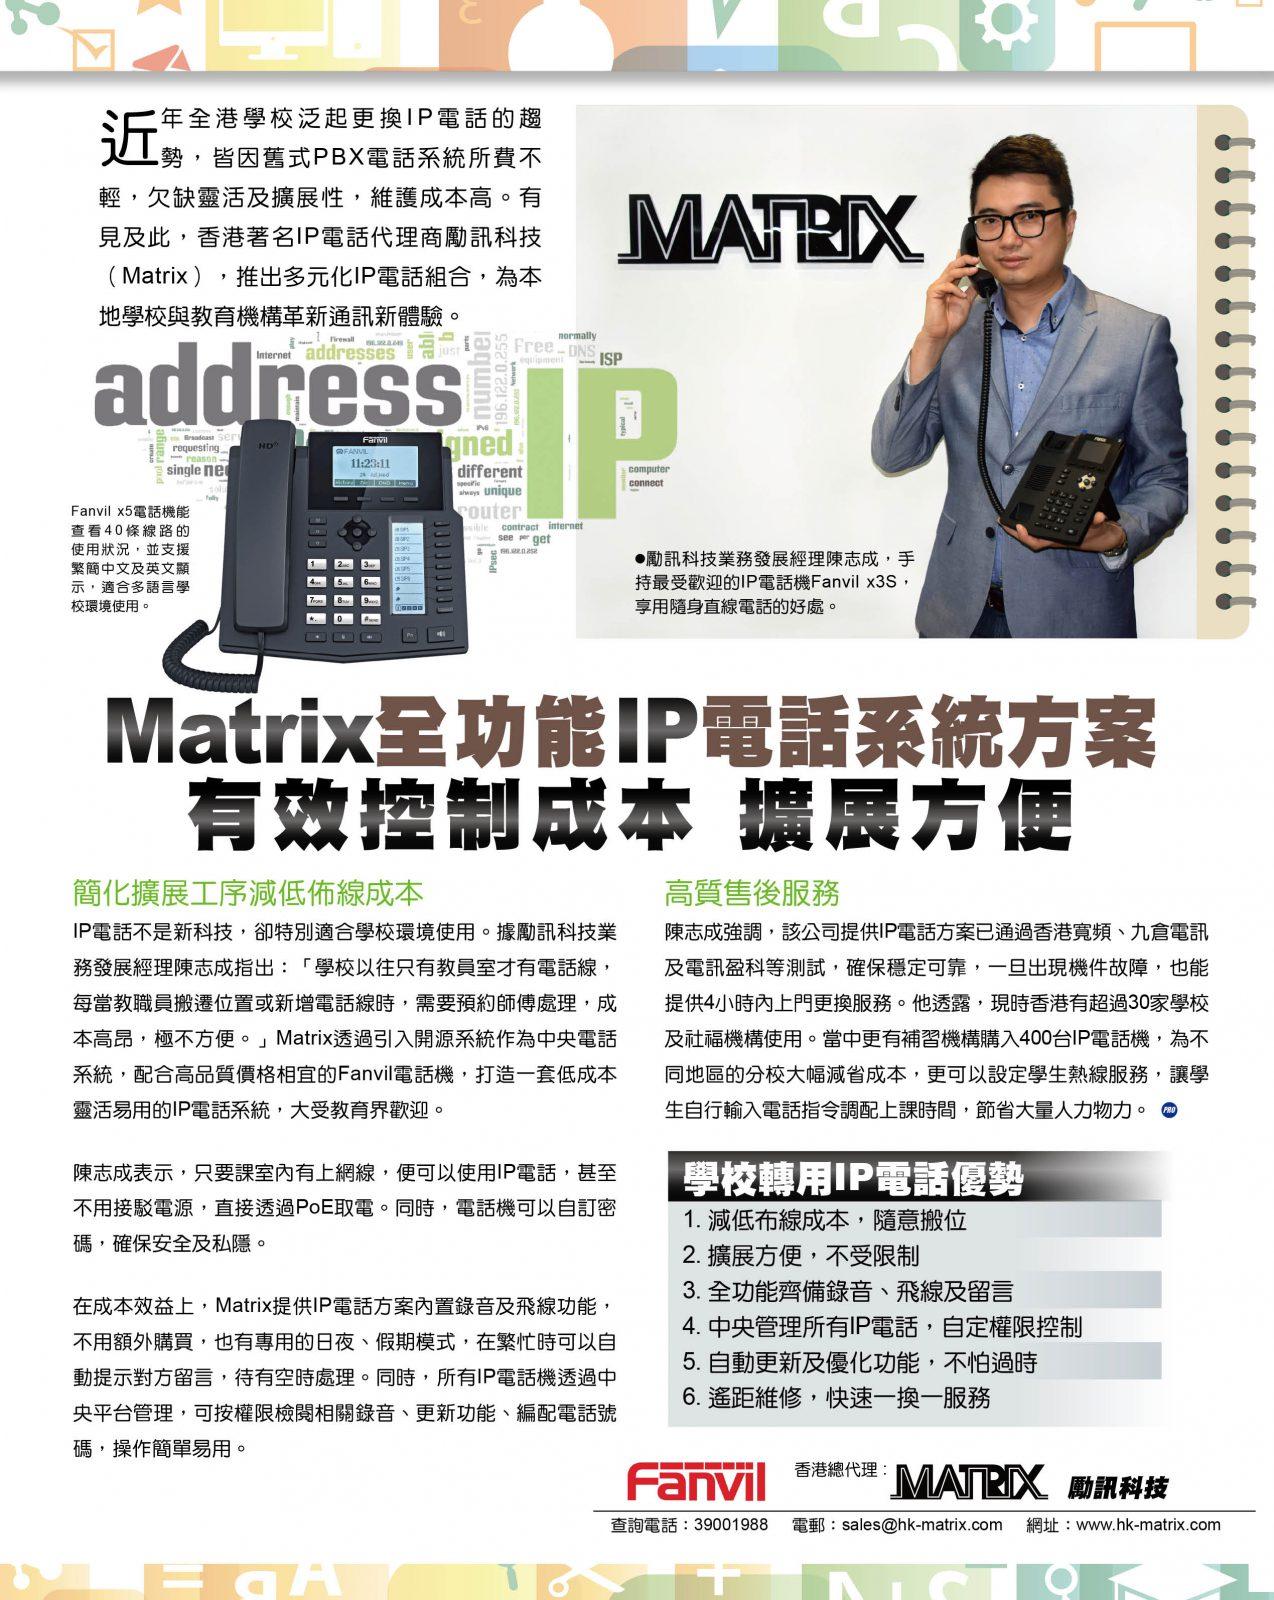 Matrix 學校IP電話系統 : 低成本 + 靈活易用,大受教育界歡迎 | Tel: 39001988